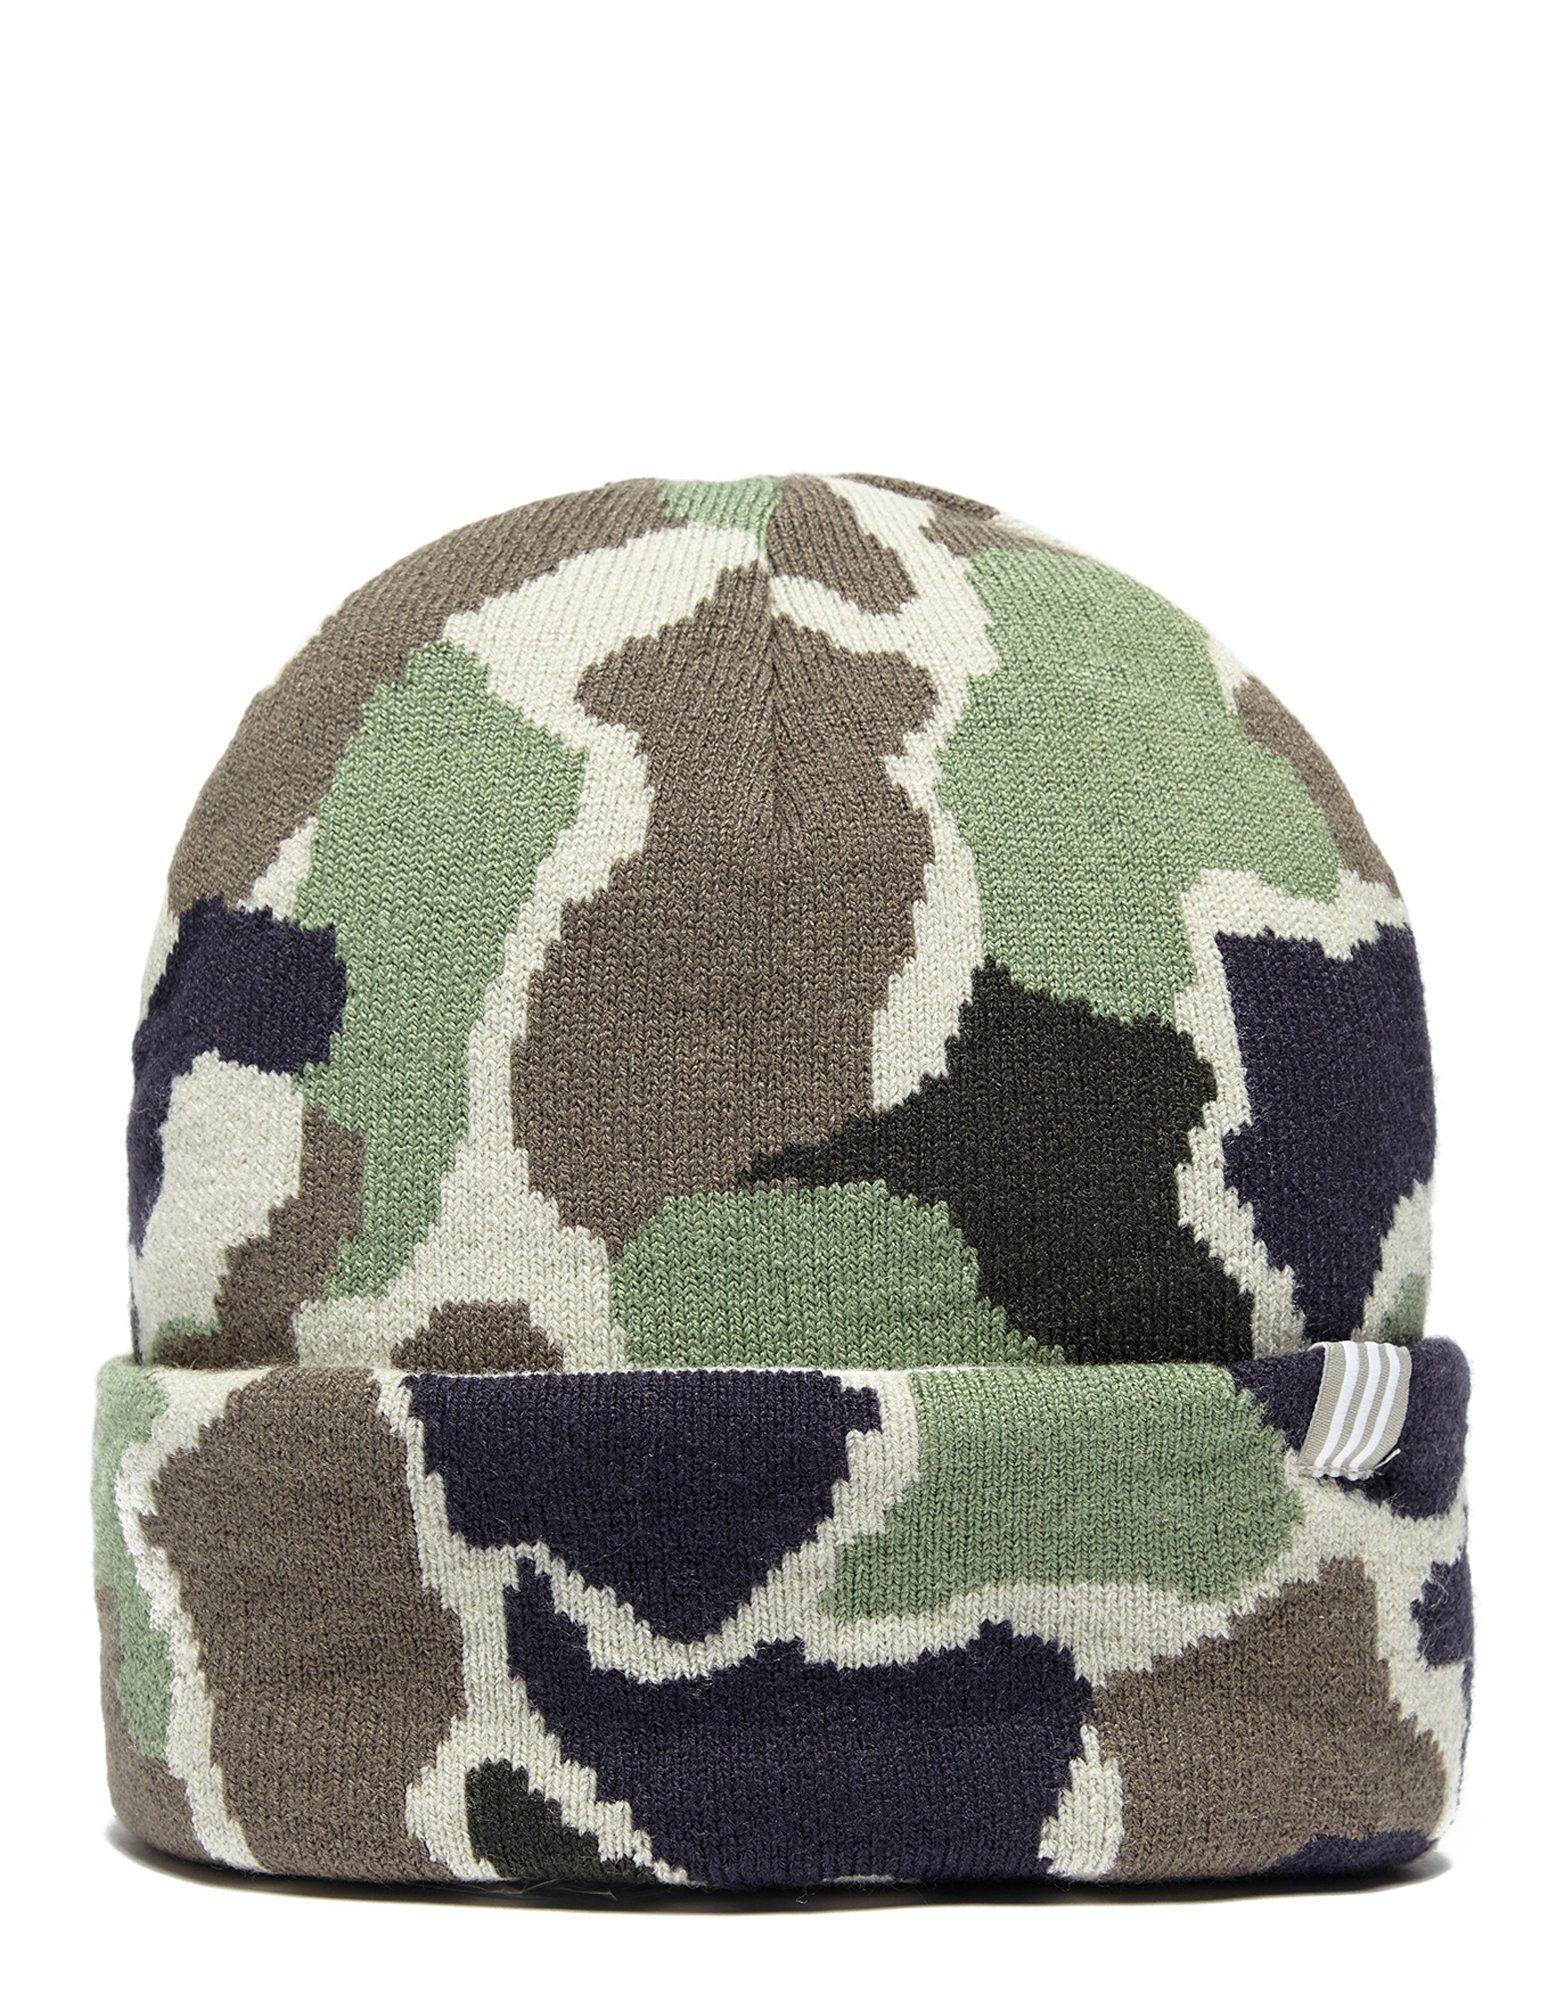 775c6761cd2e55 Lyst - adidas Originals Camo Beanie Hat for Men